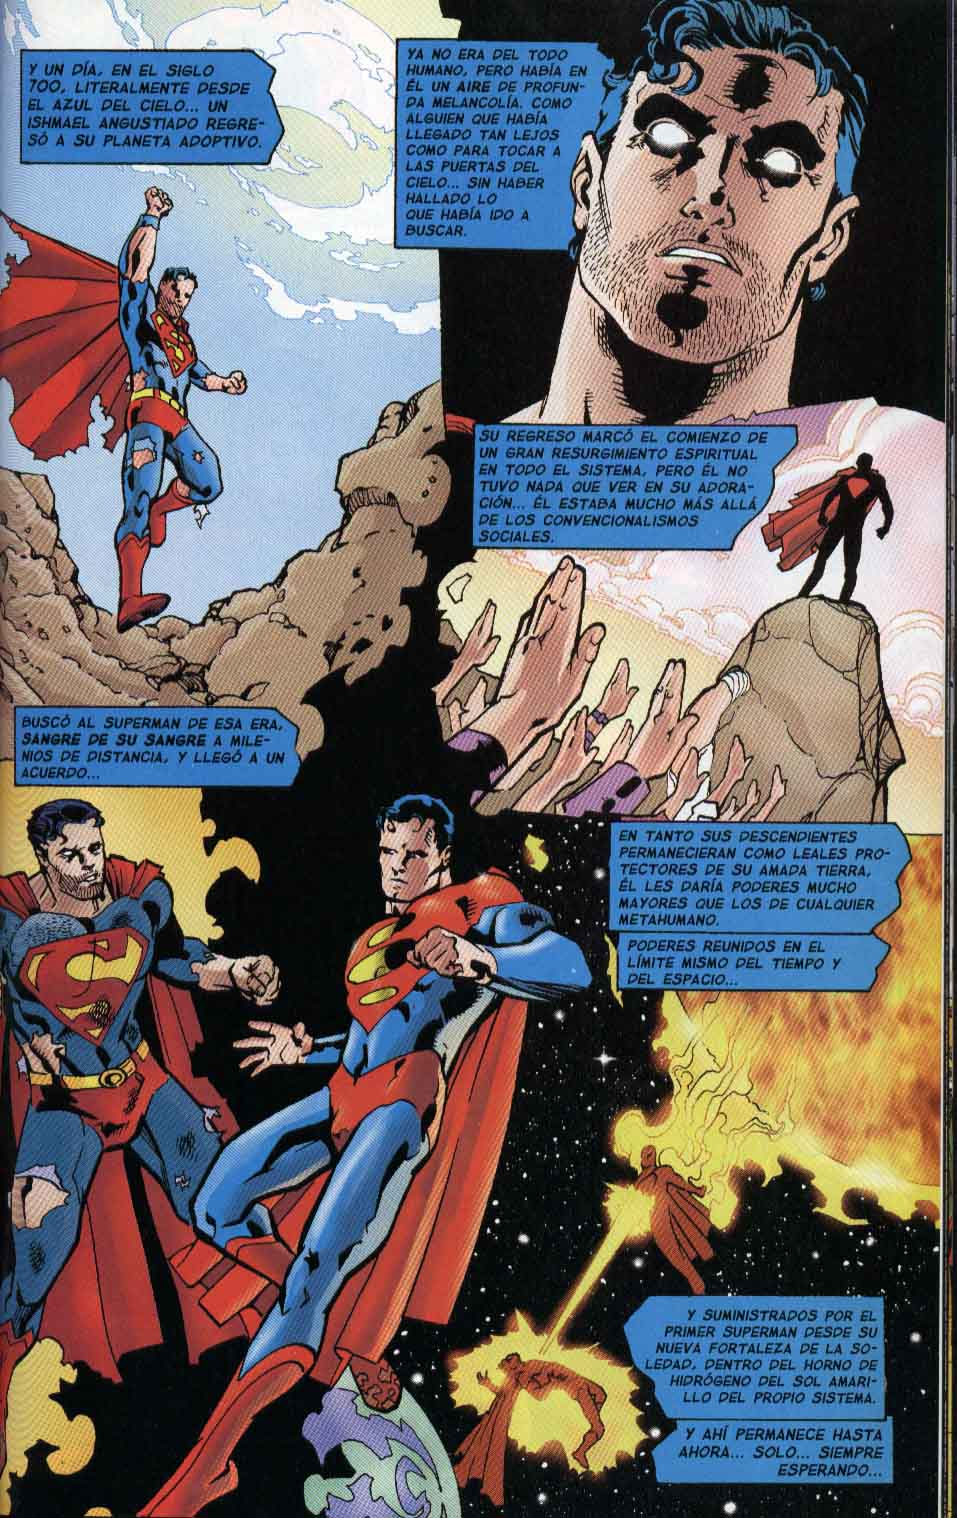 Galicia Comic: DC 1.000.000 - Superman - The Man of Tomorrow - One ...